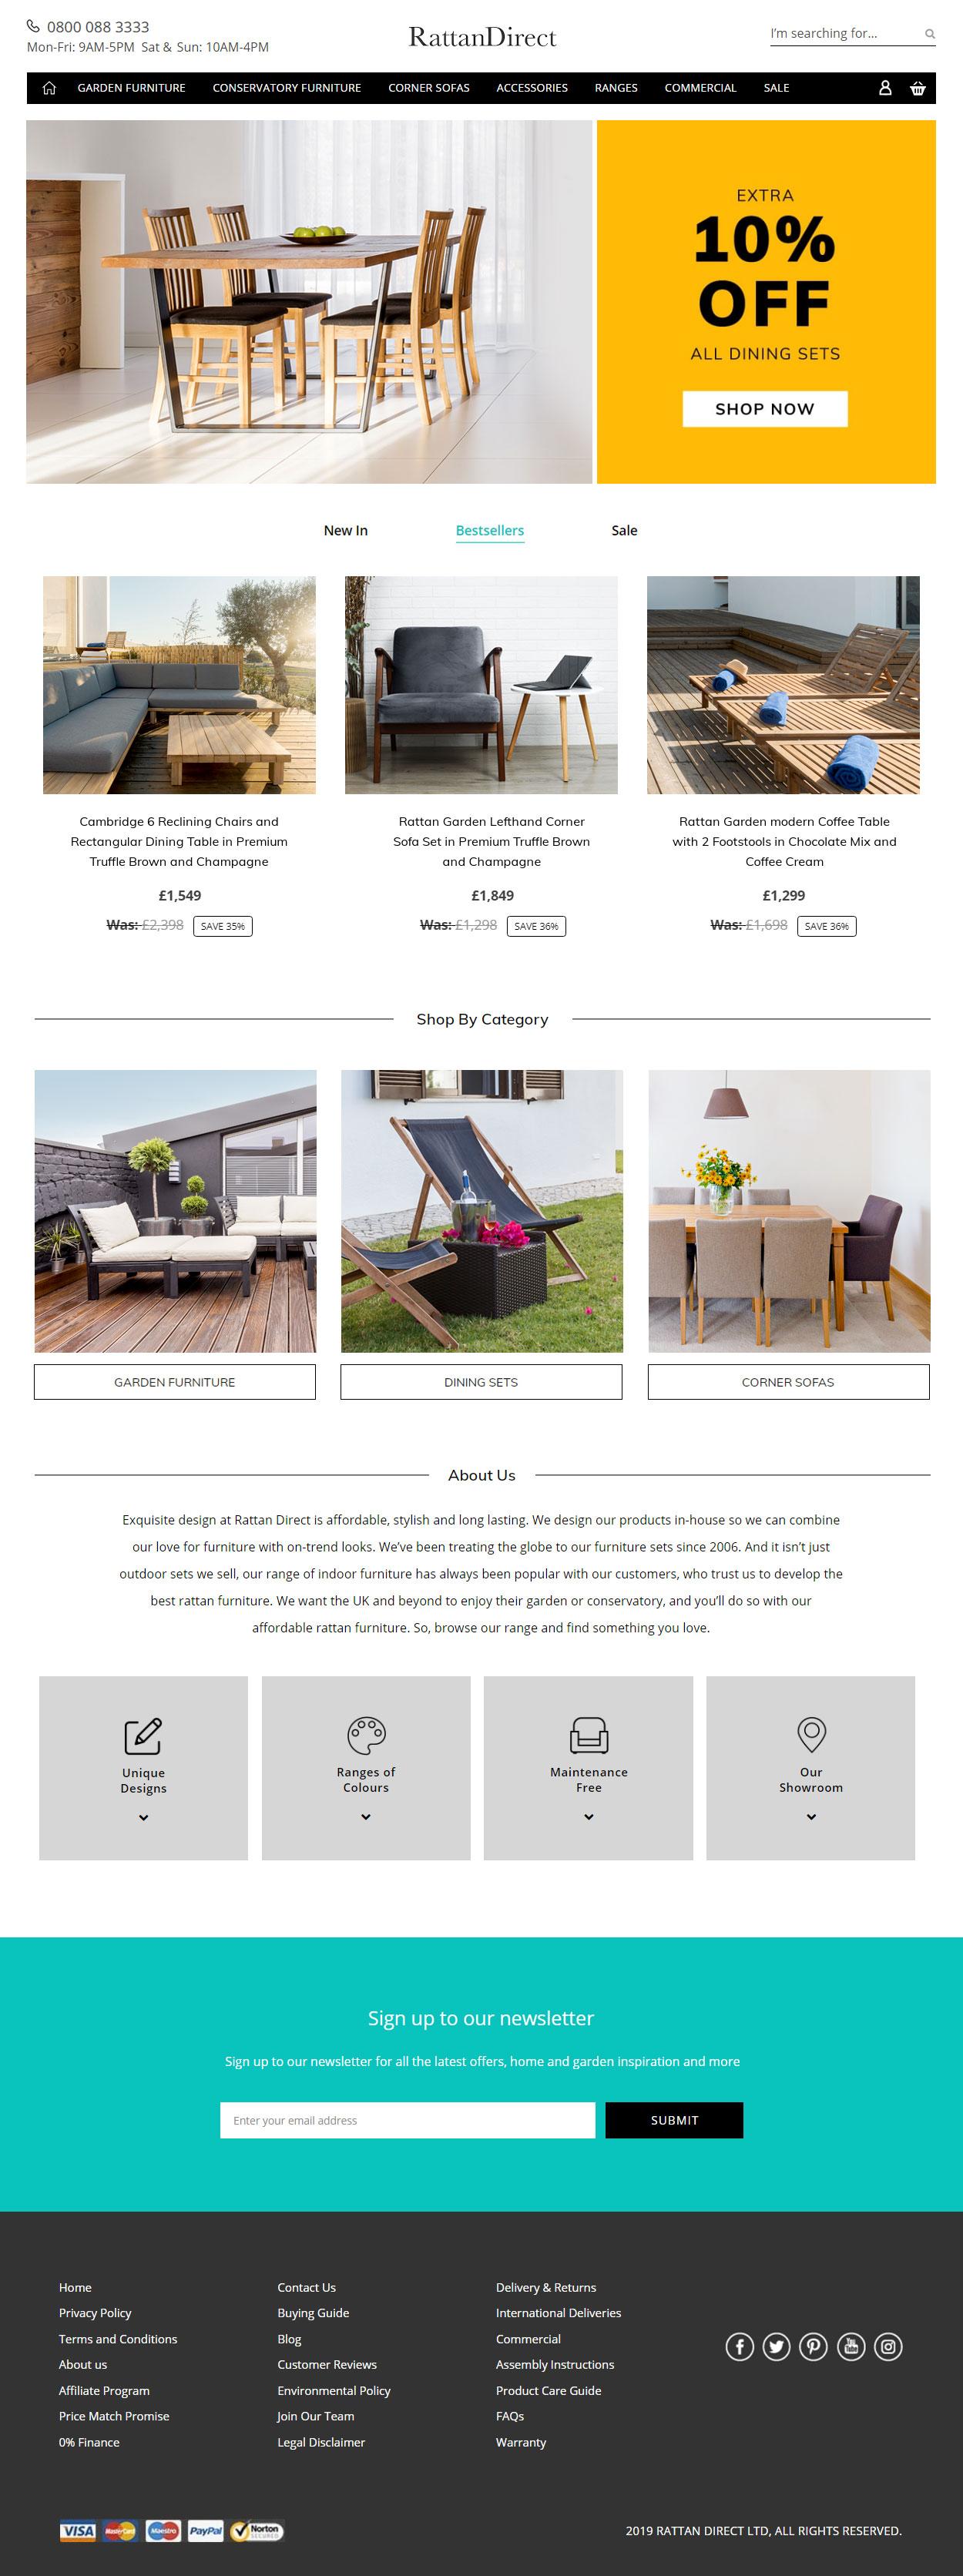 portfolio-detail-rattandirect-img-02